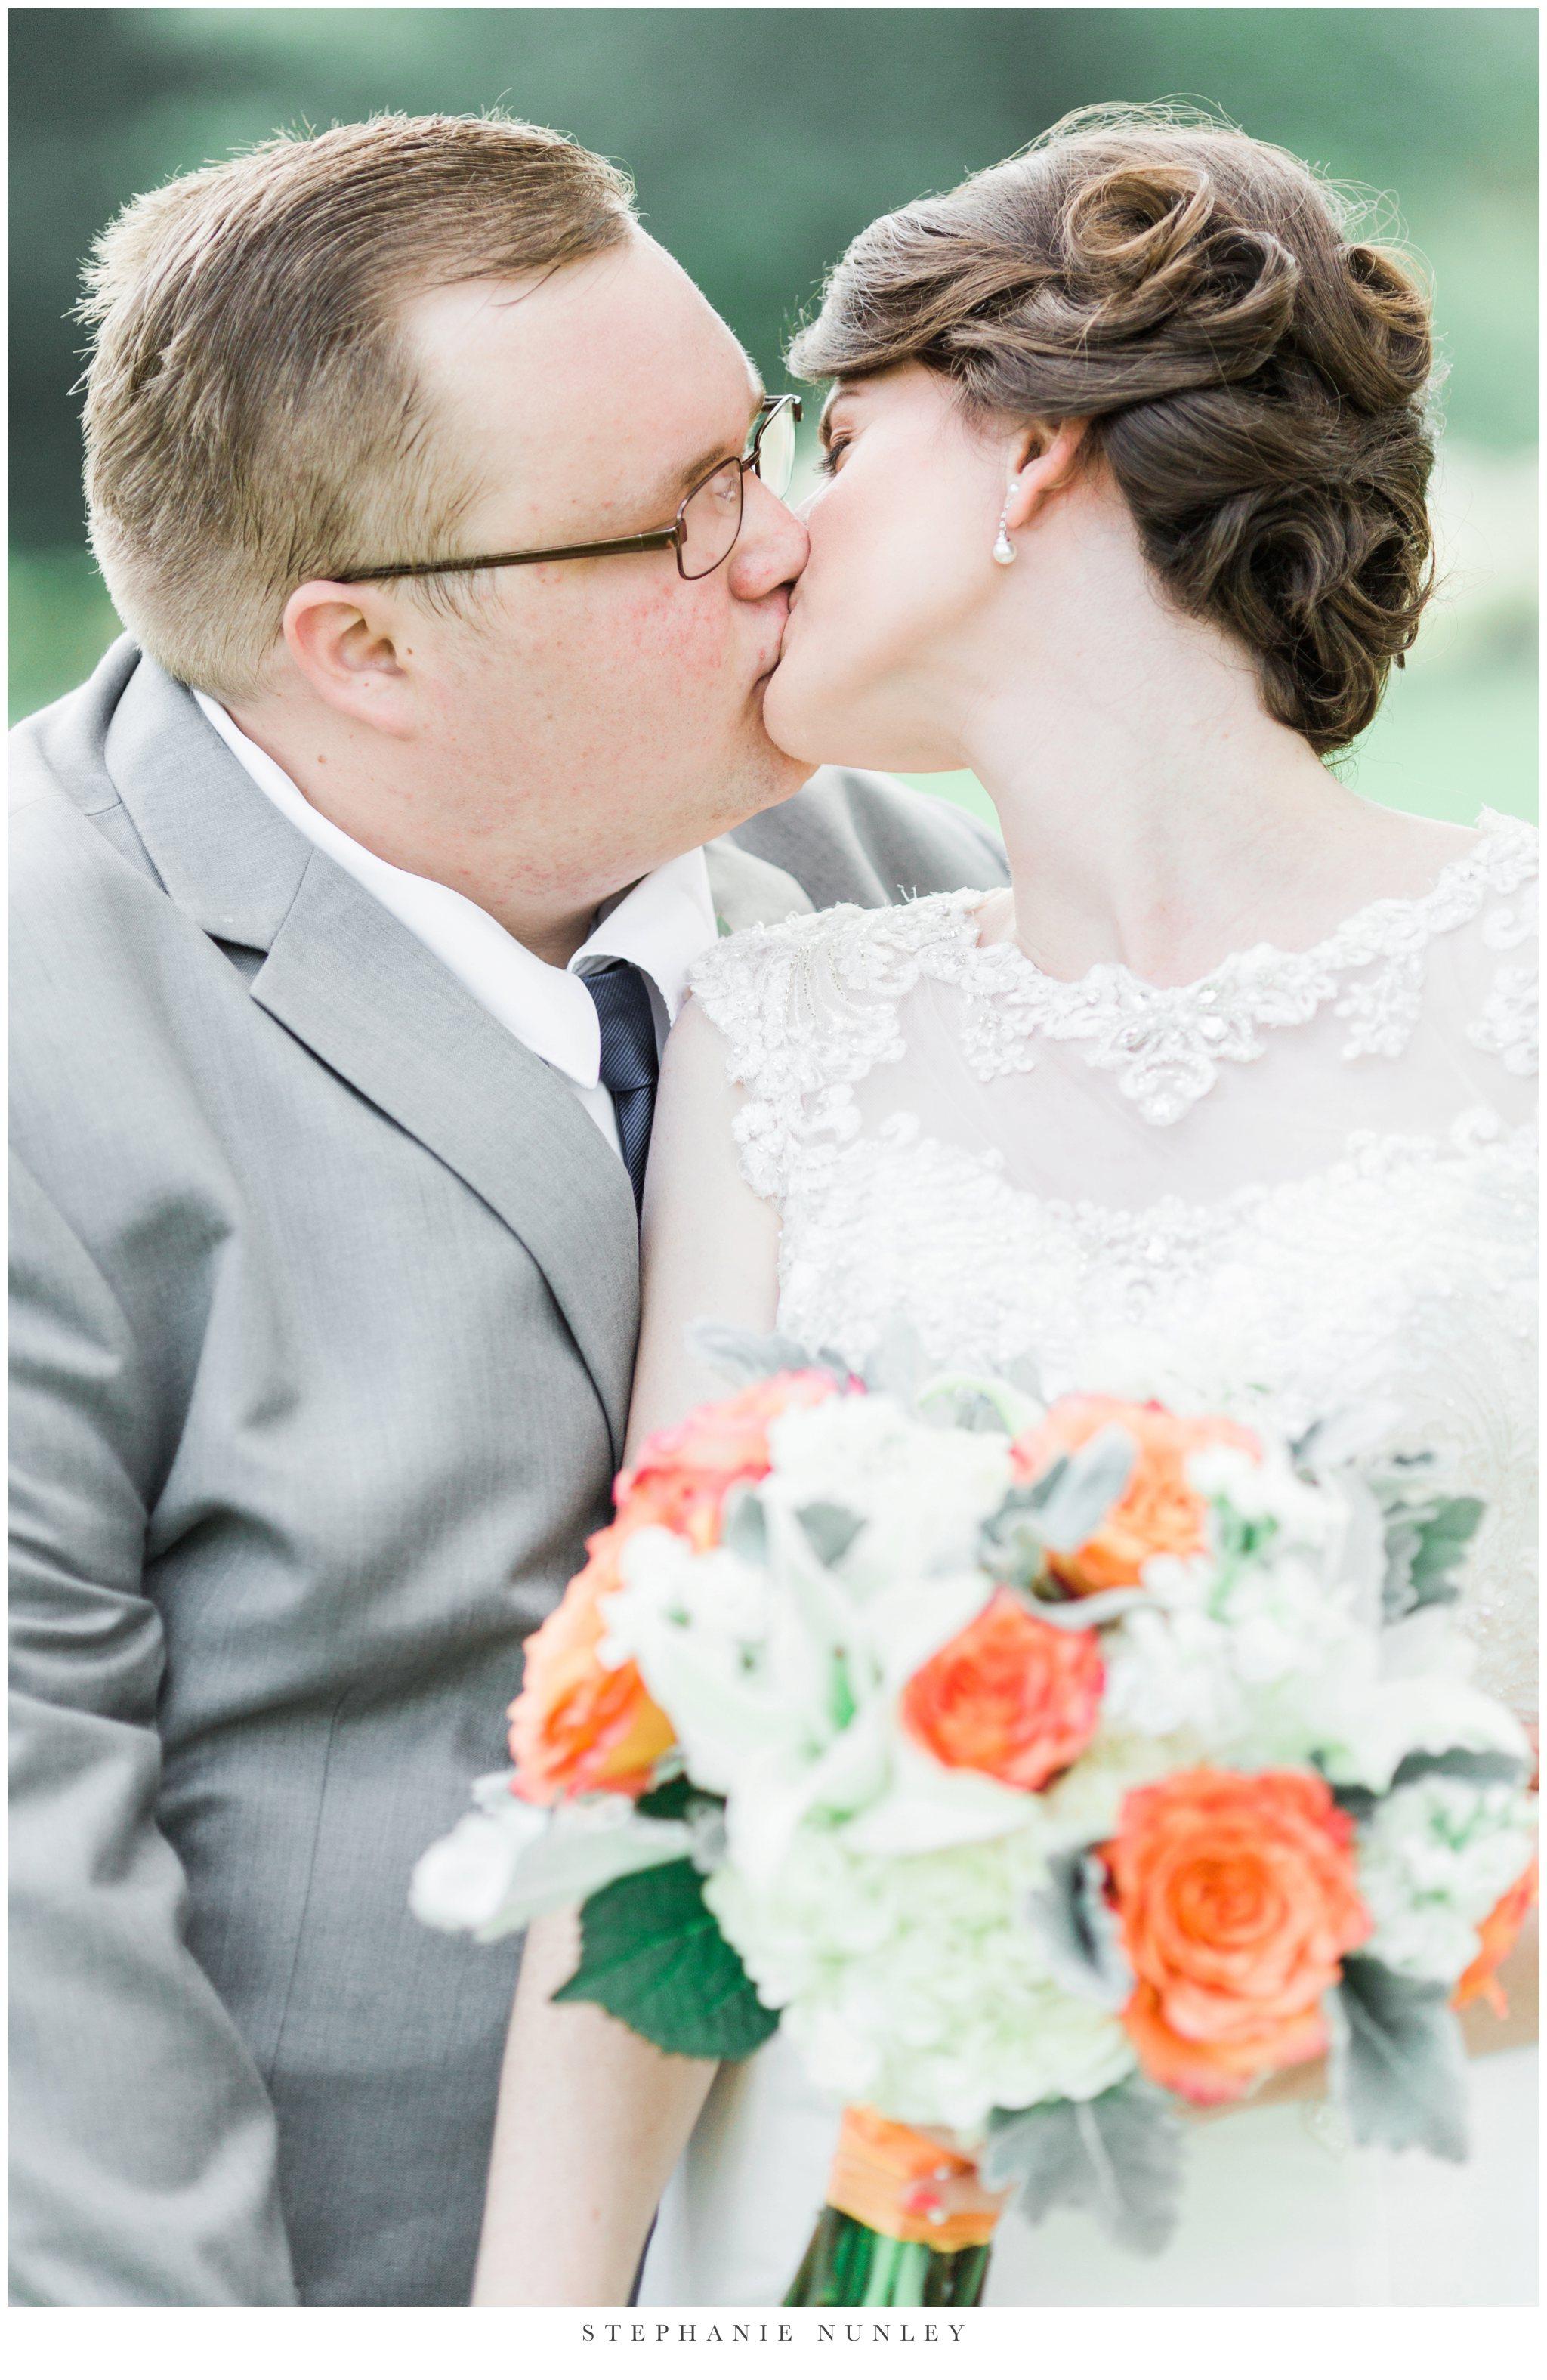 next-level-events-wedding-photos-in-little-rock-0031.jpg